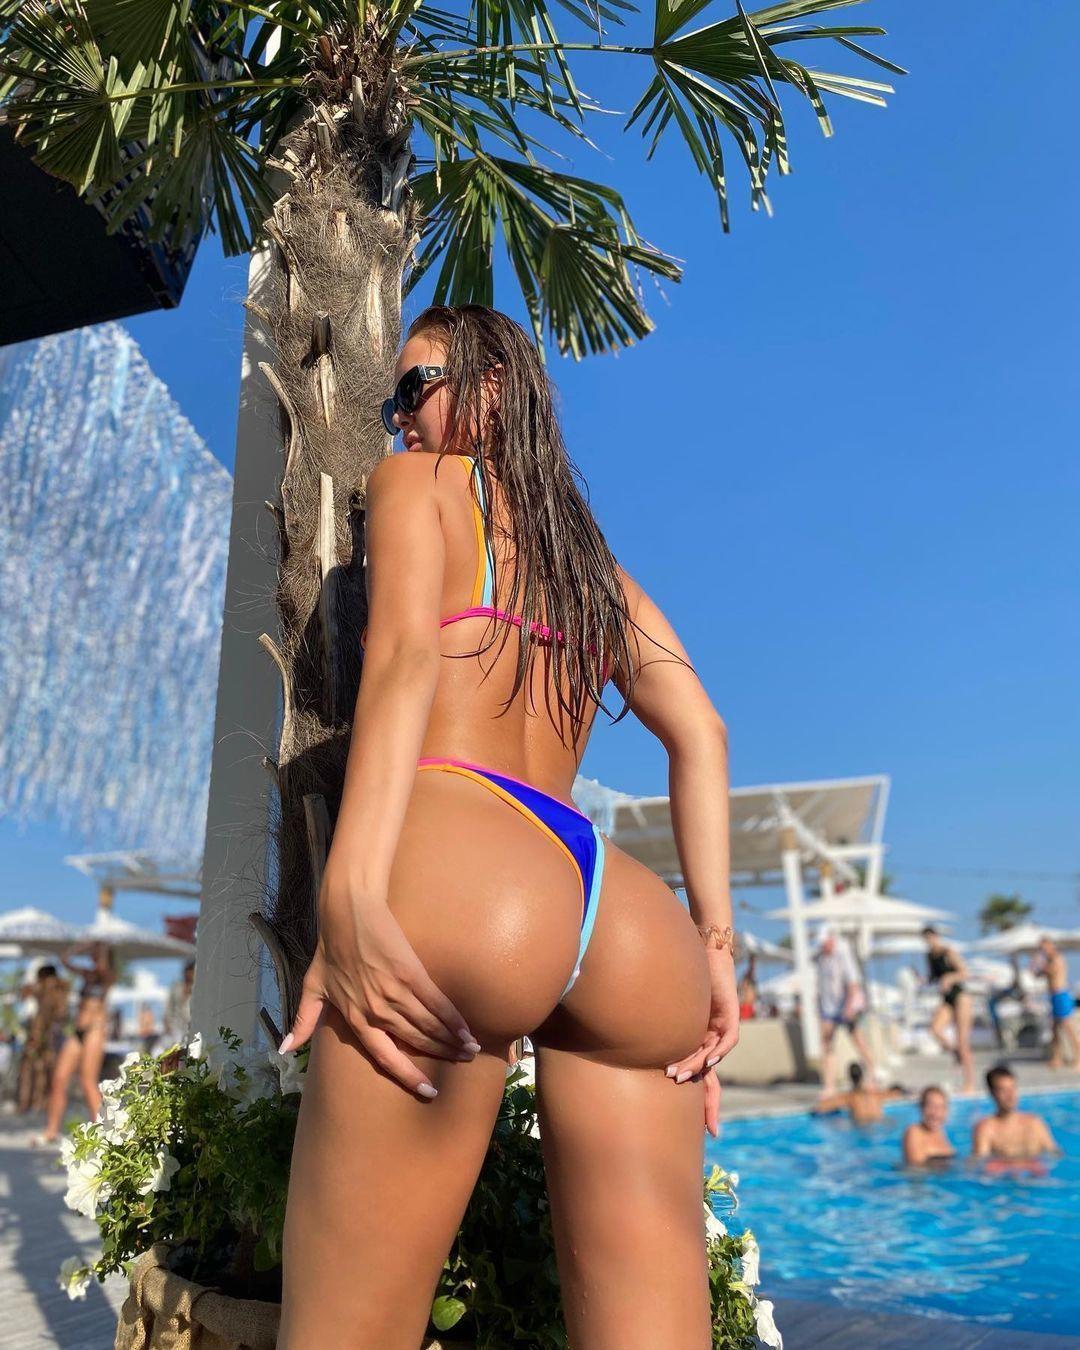 Молодуха трясёт задницей у бассейна